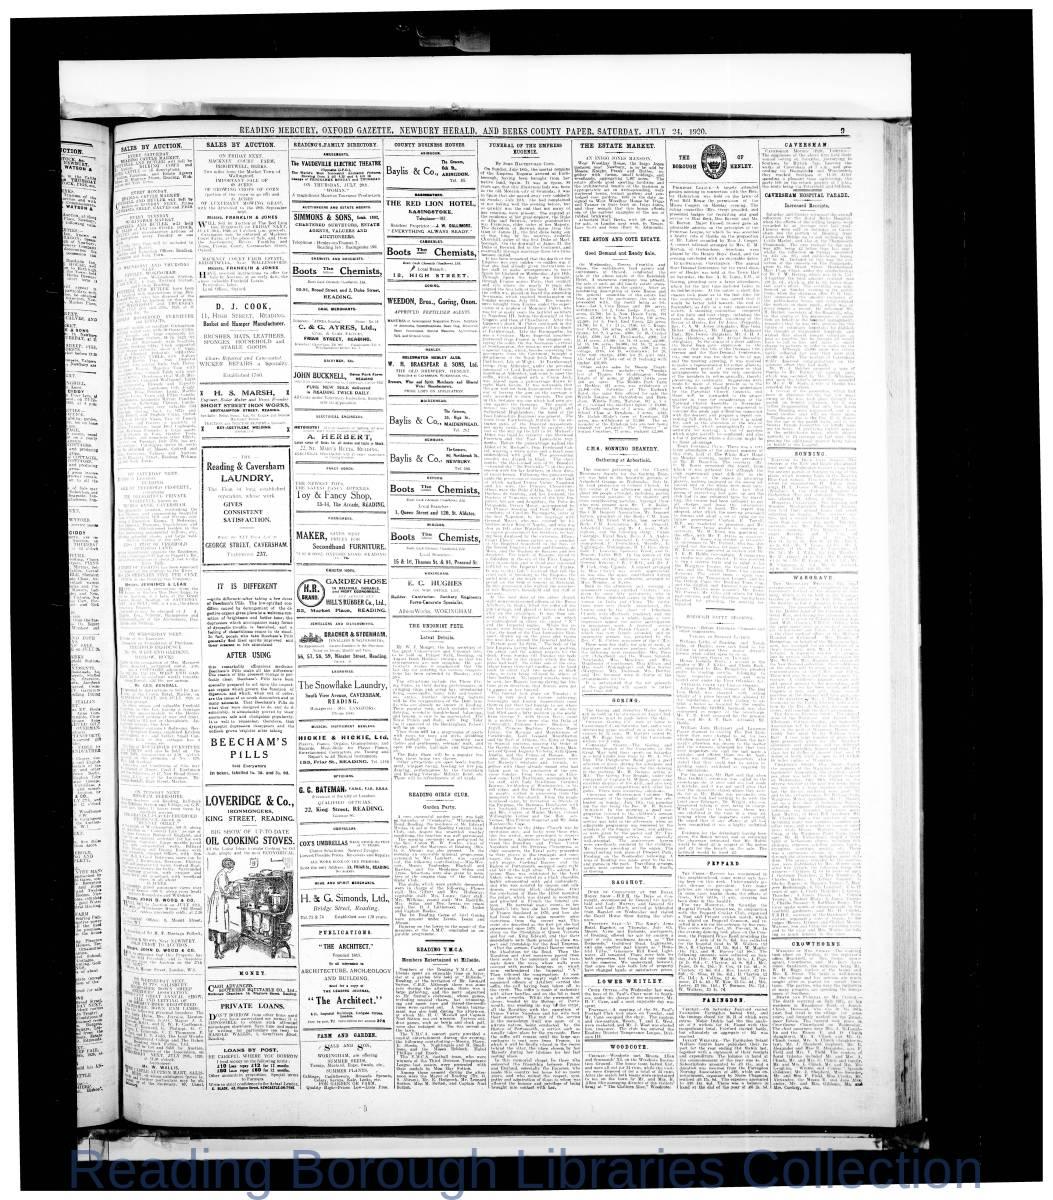 Reading Mercury Oxford Gazette Saturday , July 24, 1920. Pg 9